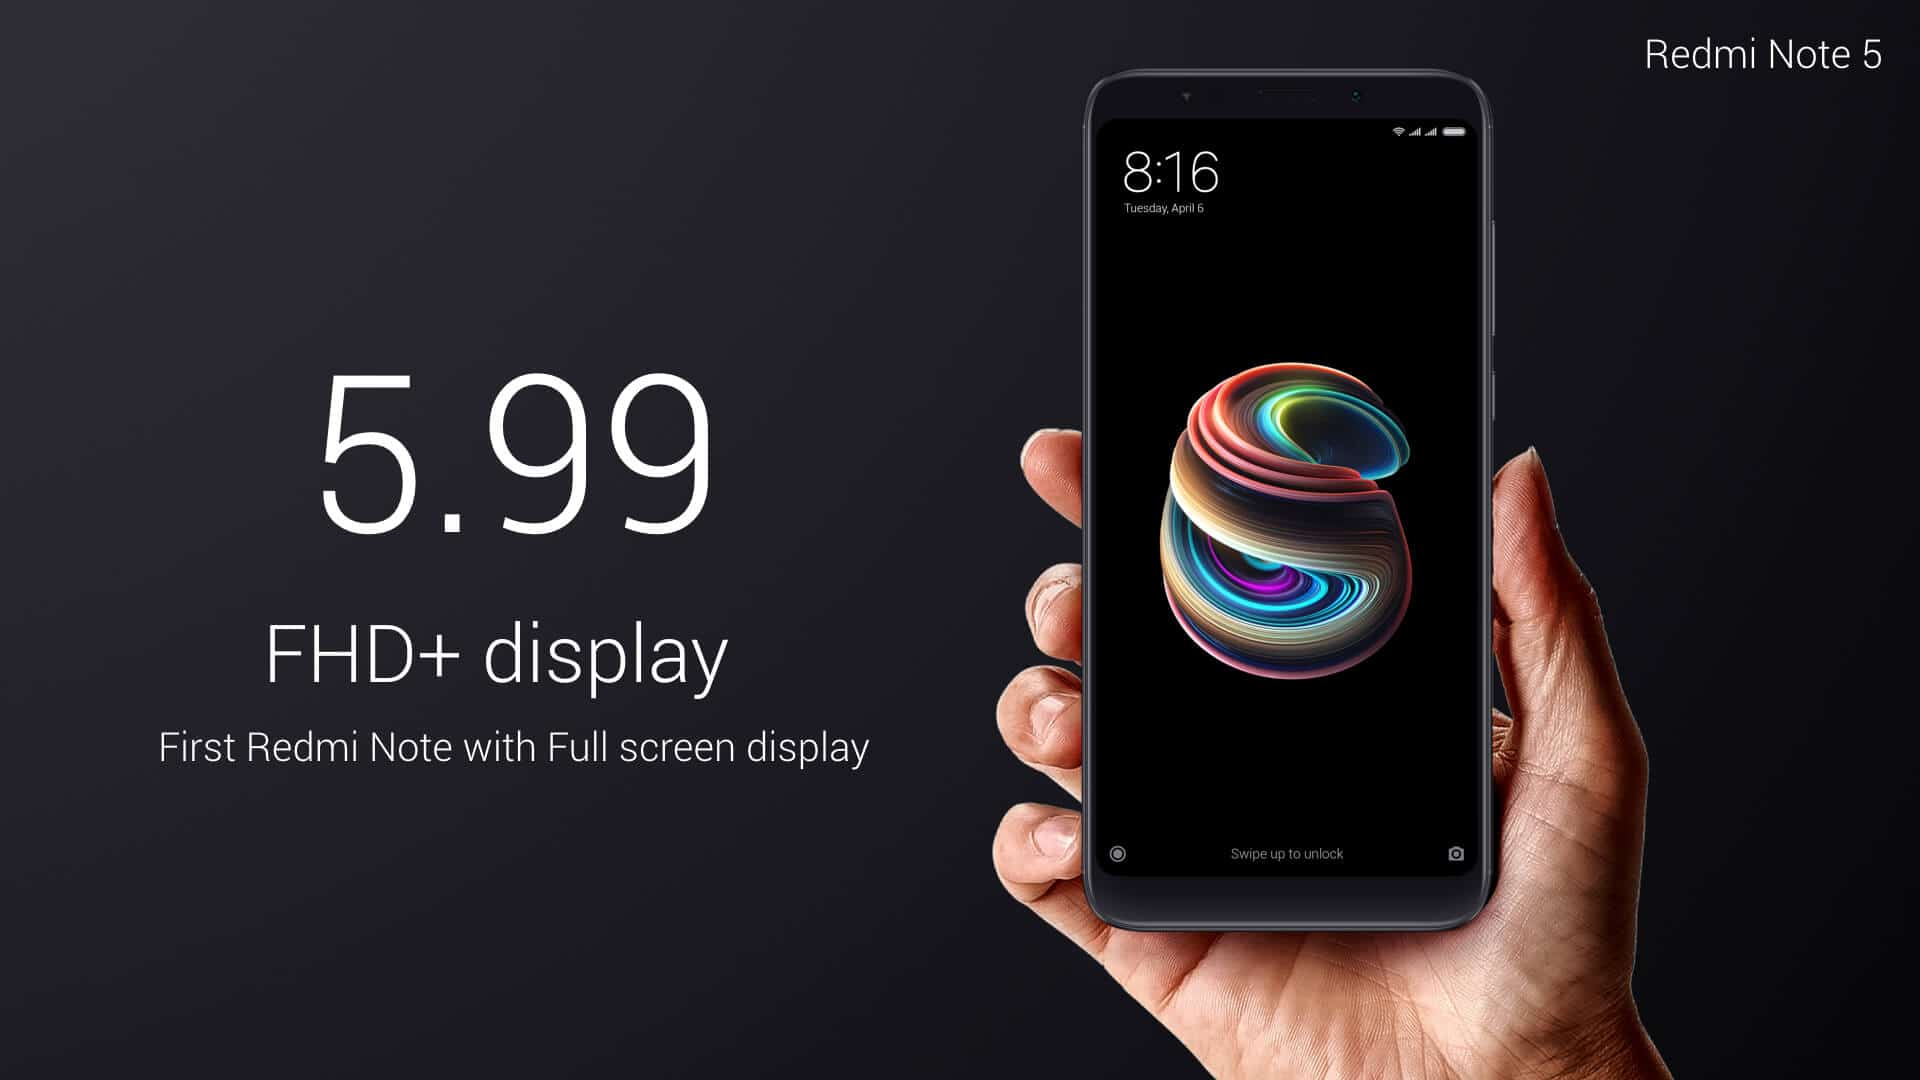 Xiaomi Redmi Note 5 official image 5